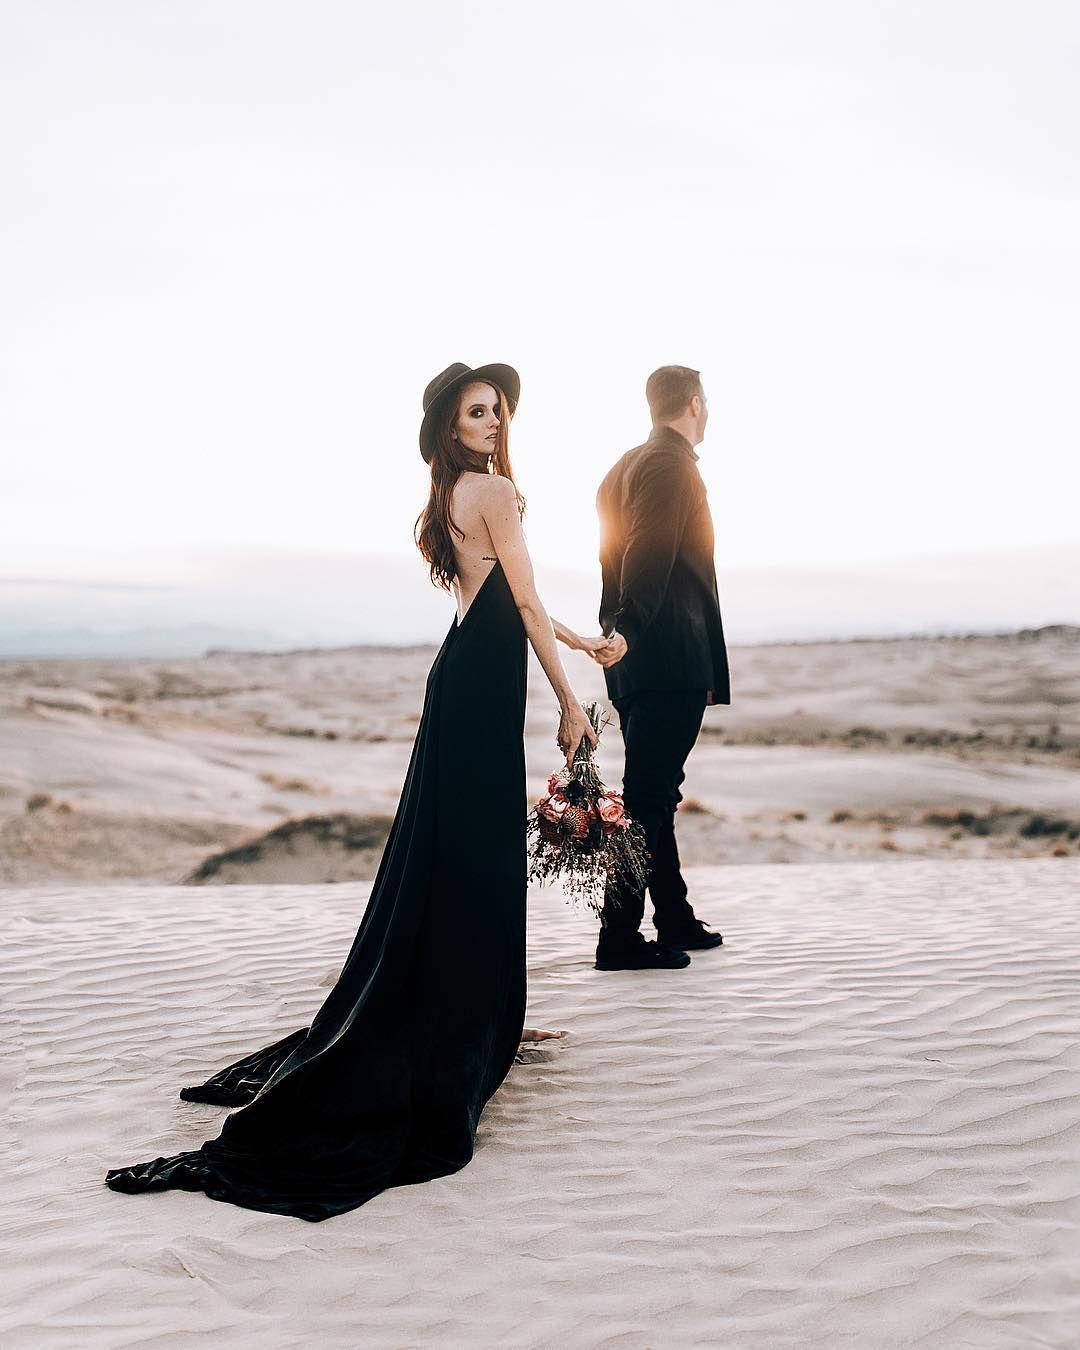 couplegoals #couple #blackdress | flths | Wedding photo